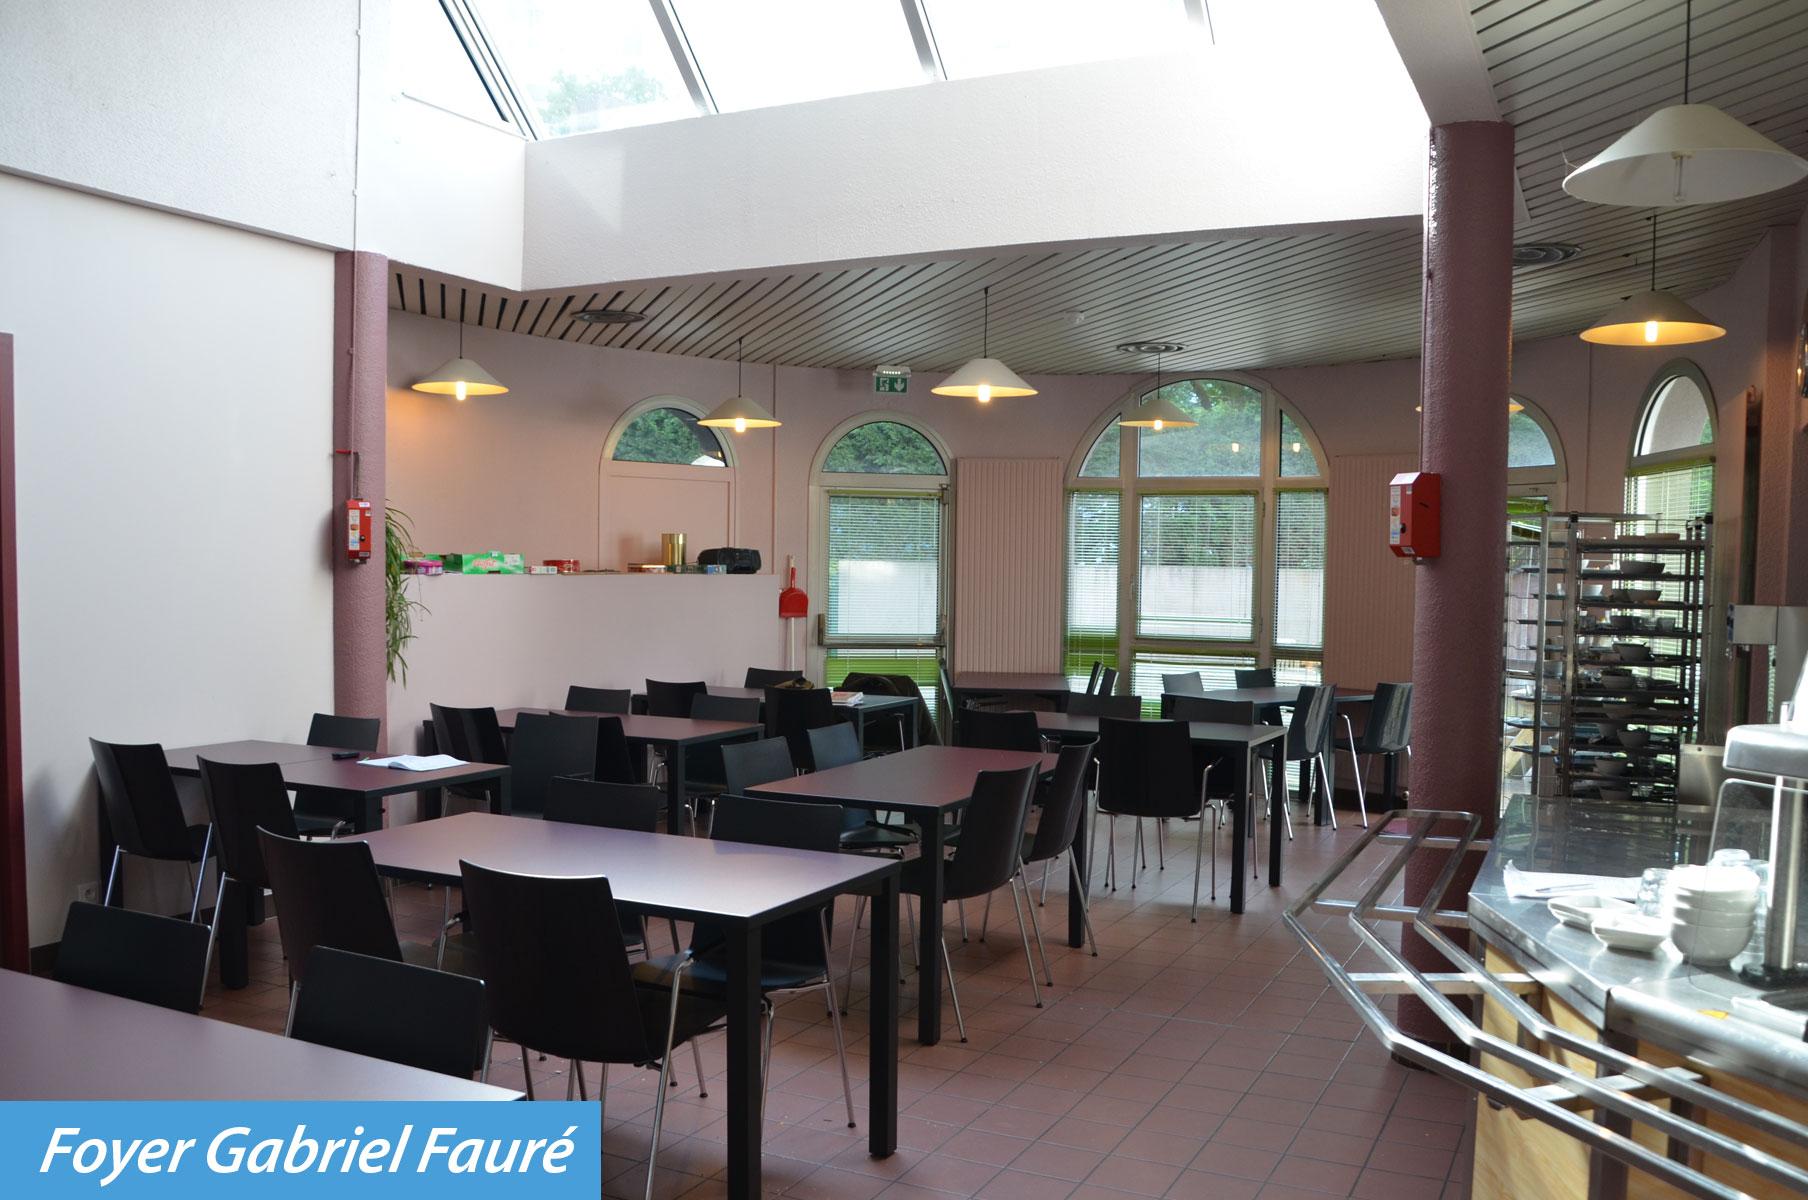 Foyer Art Et Vie : Foyer savs logac gabriel fauré apei ouest